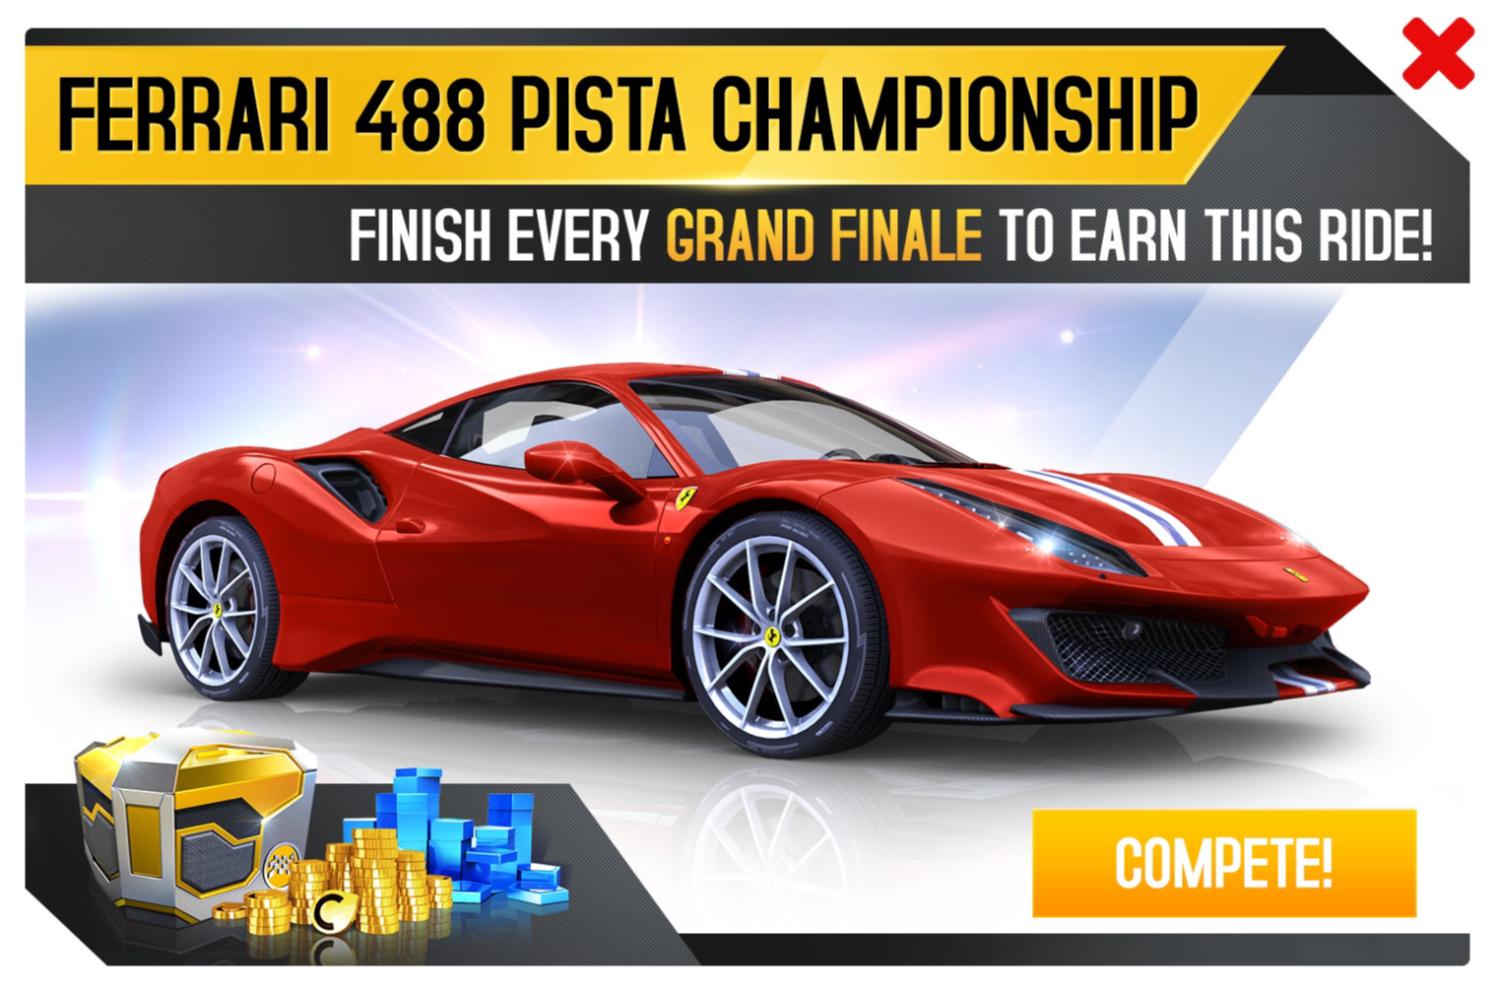 Ferrari 488 Pista (Championship)